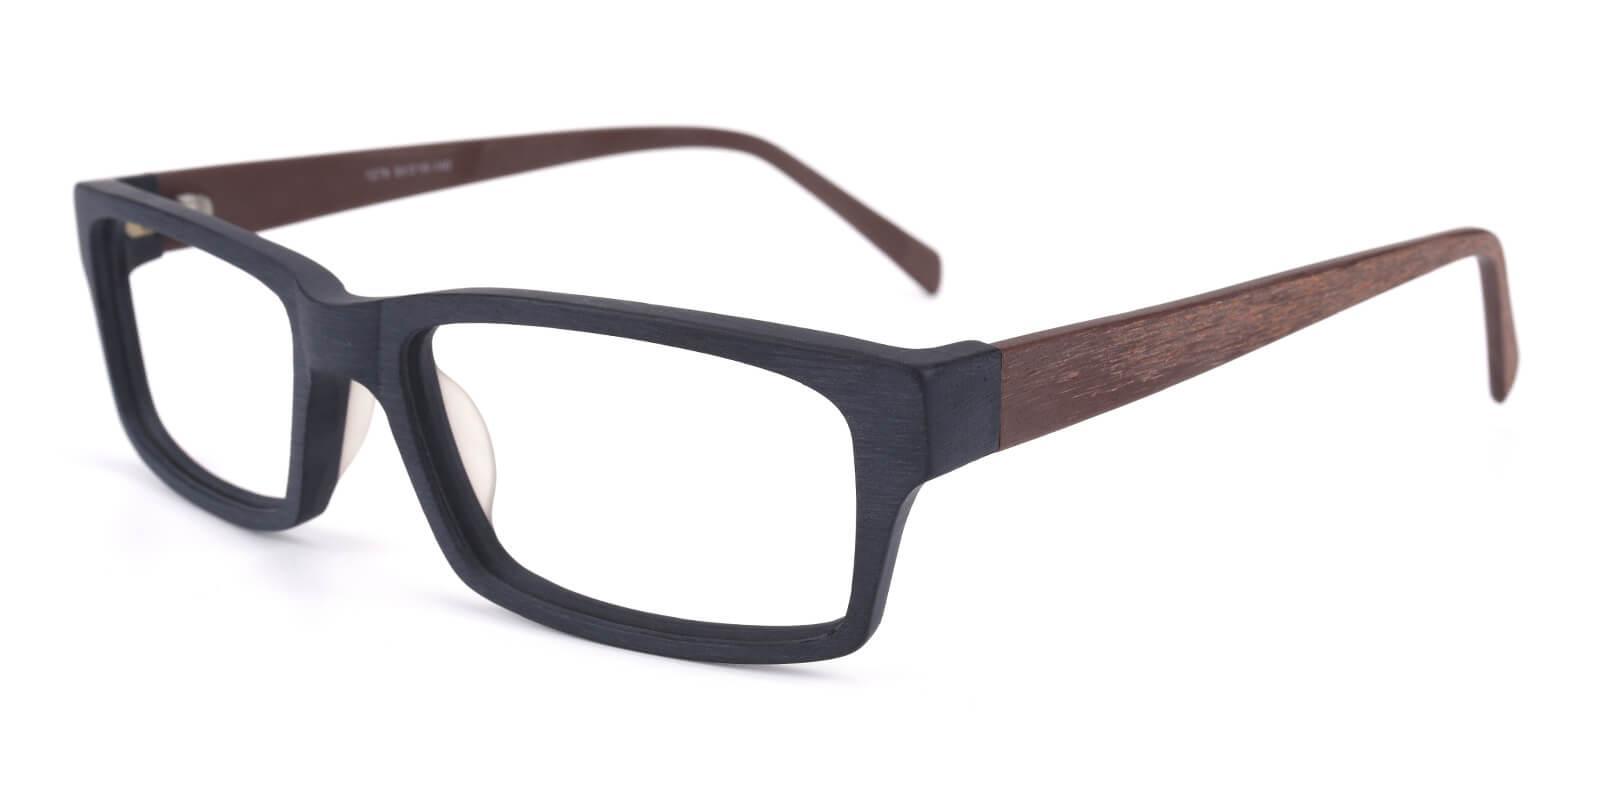 Nadien-Brown-Rectangle-Acetate-Eyeglasses-additional1